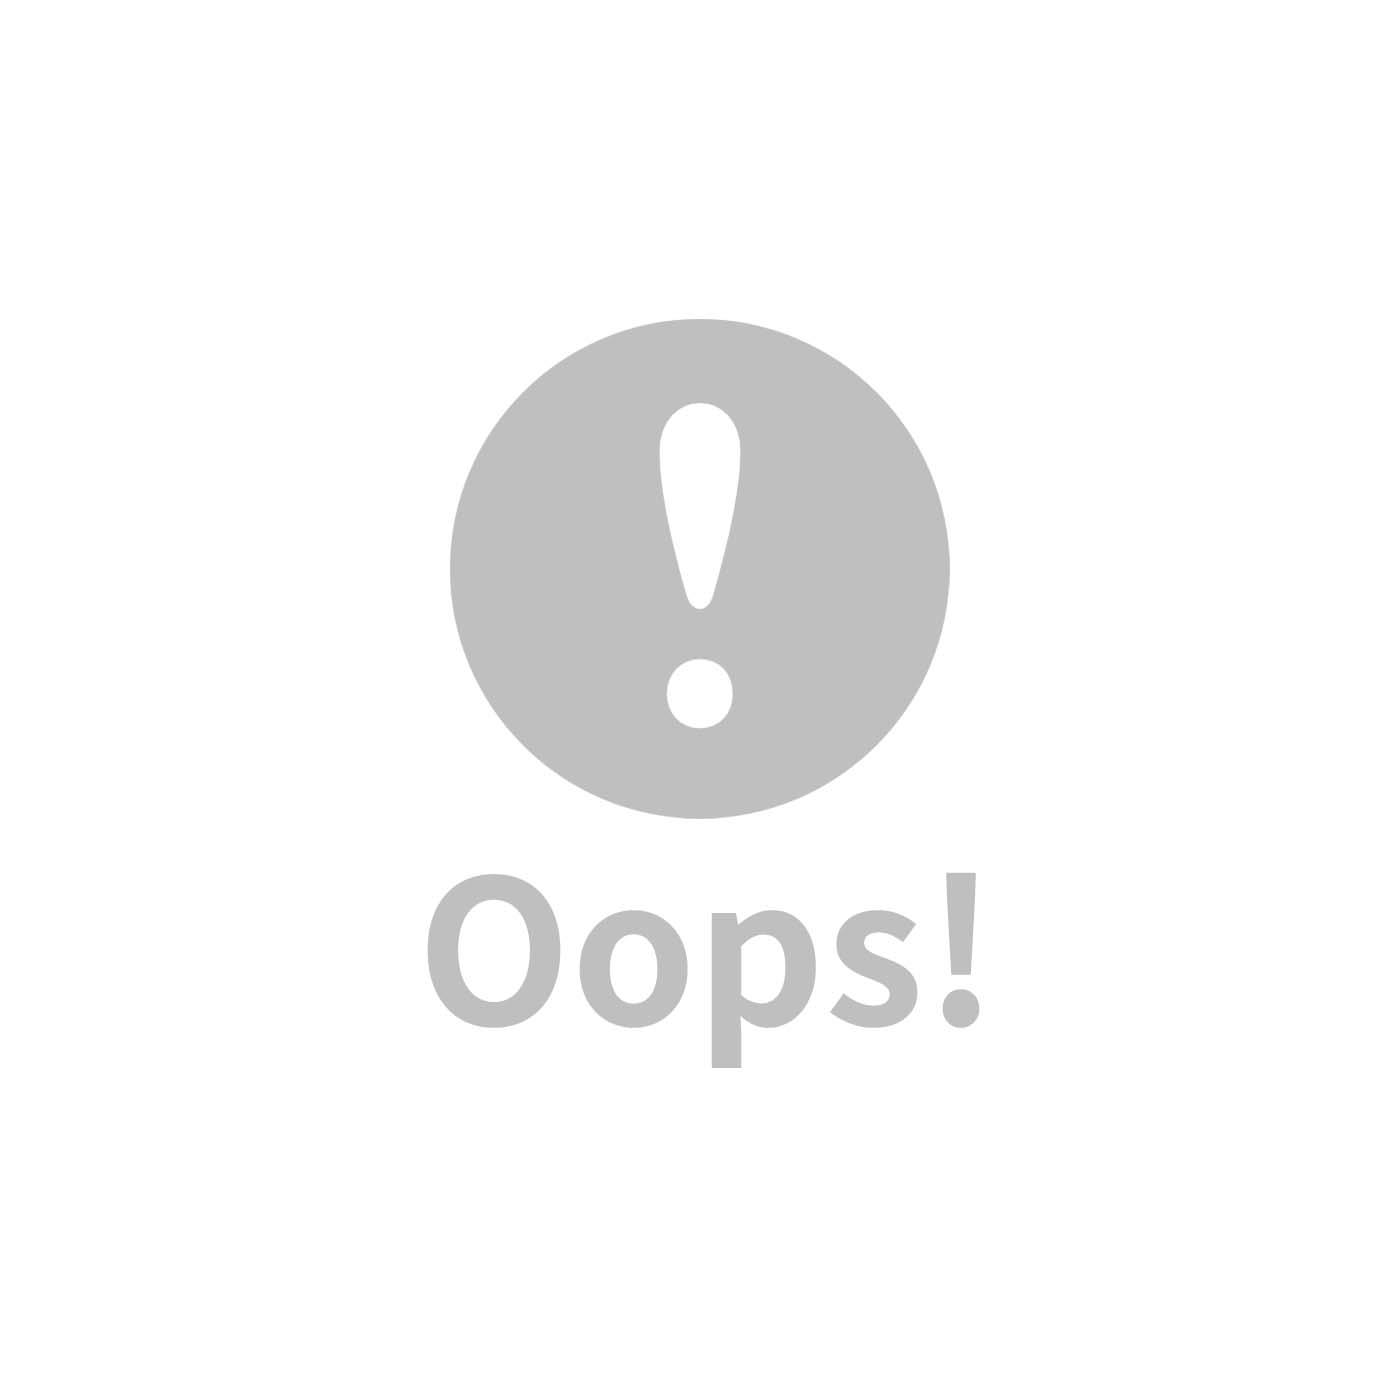 global affairs 童話手工編織安撫玩偶(27cm)-綿羊雪莉